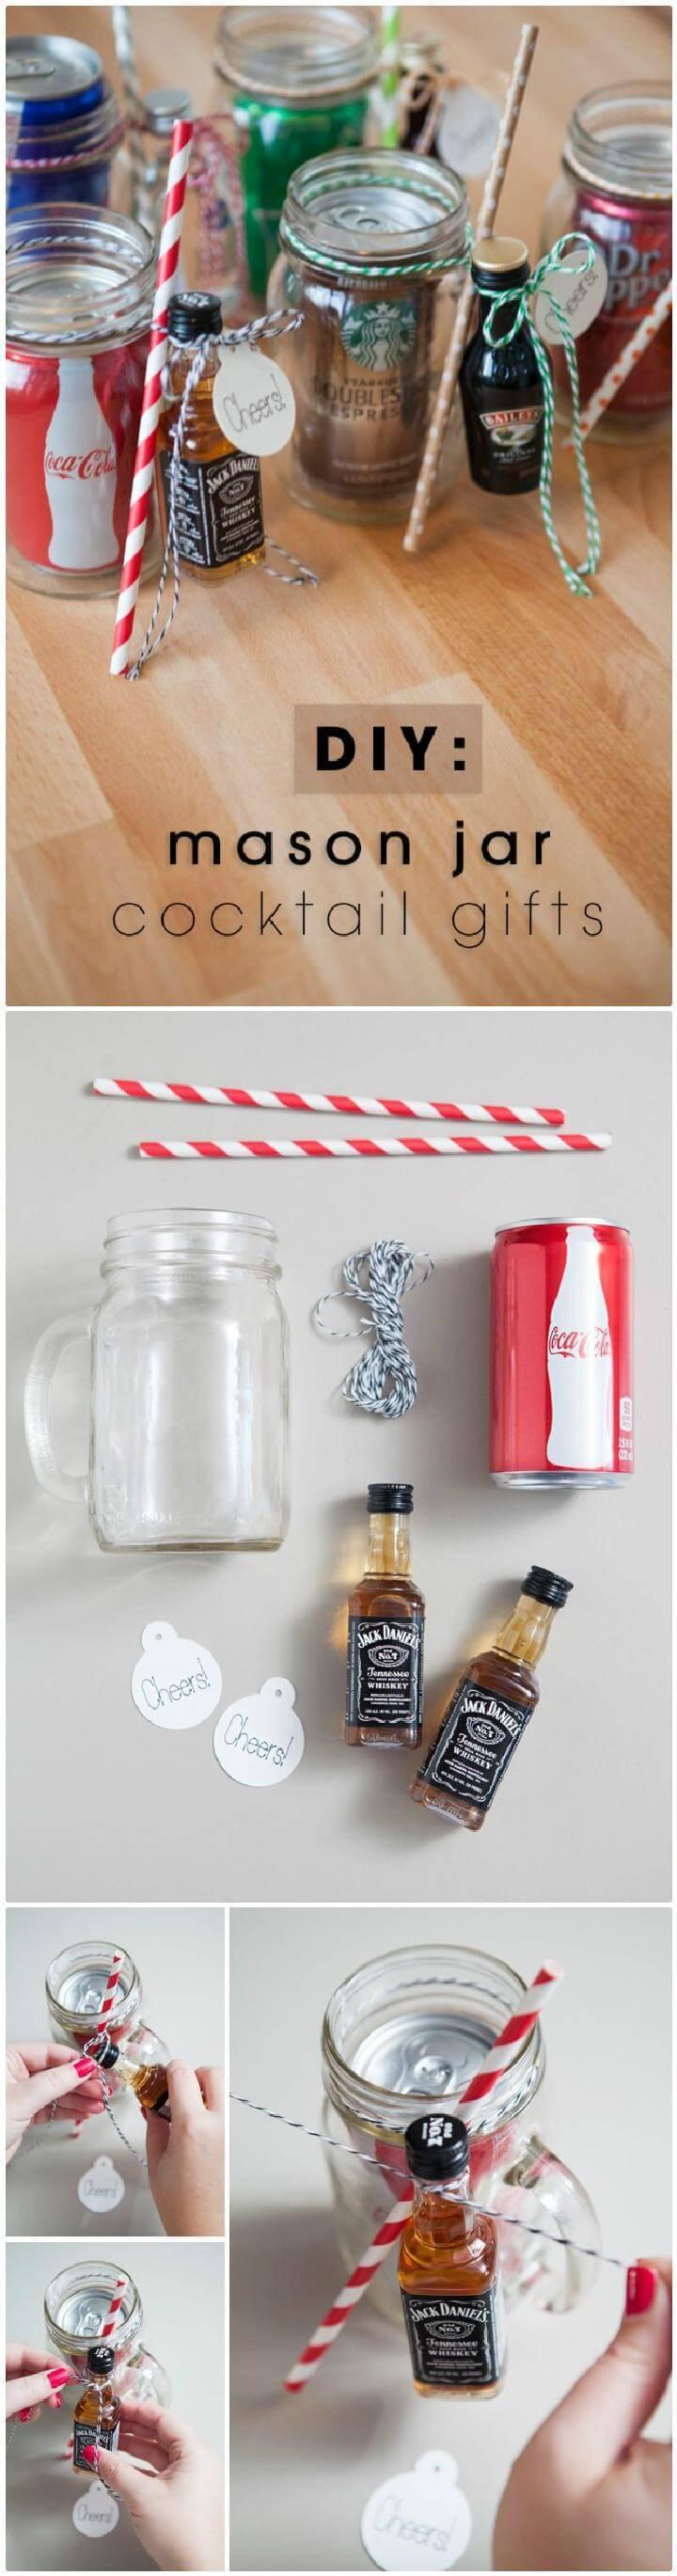 DIY Easy Mason Jar Cocktail Gifts